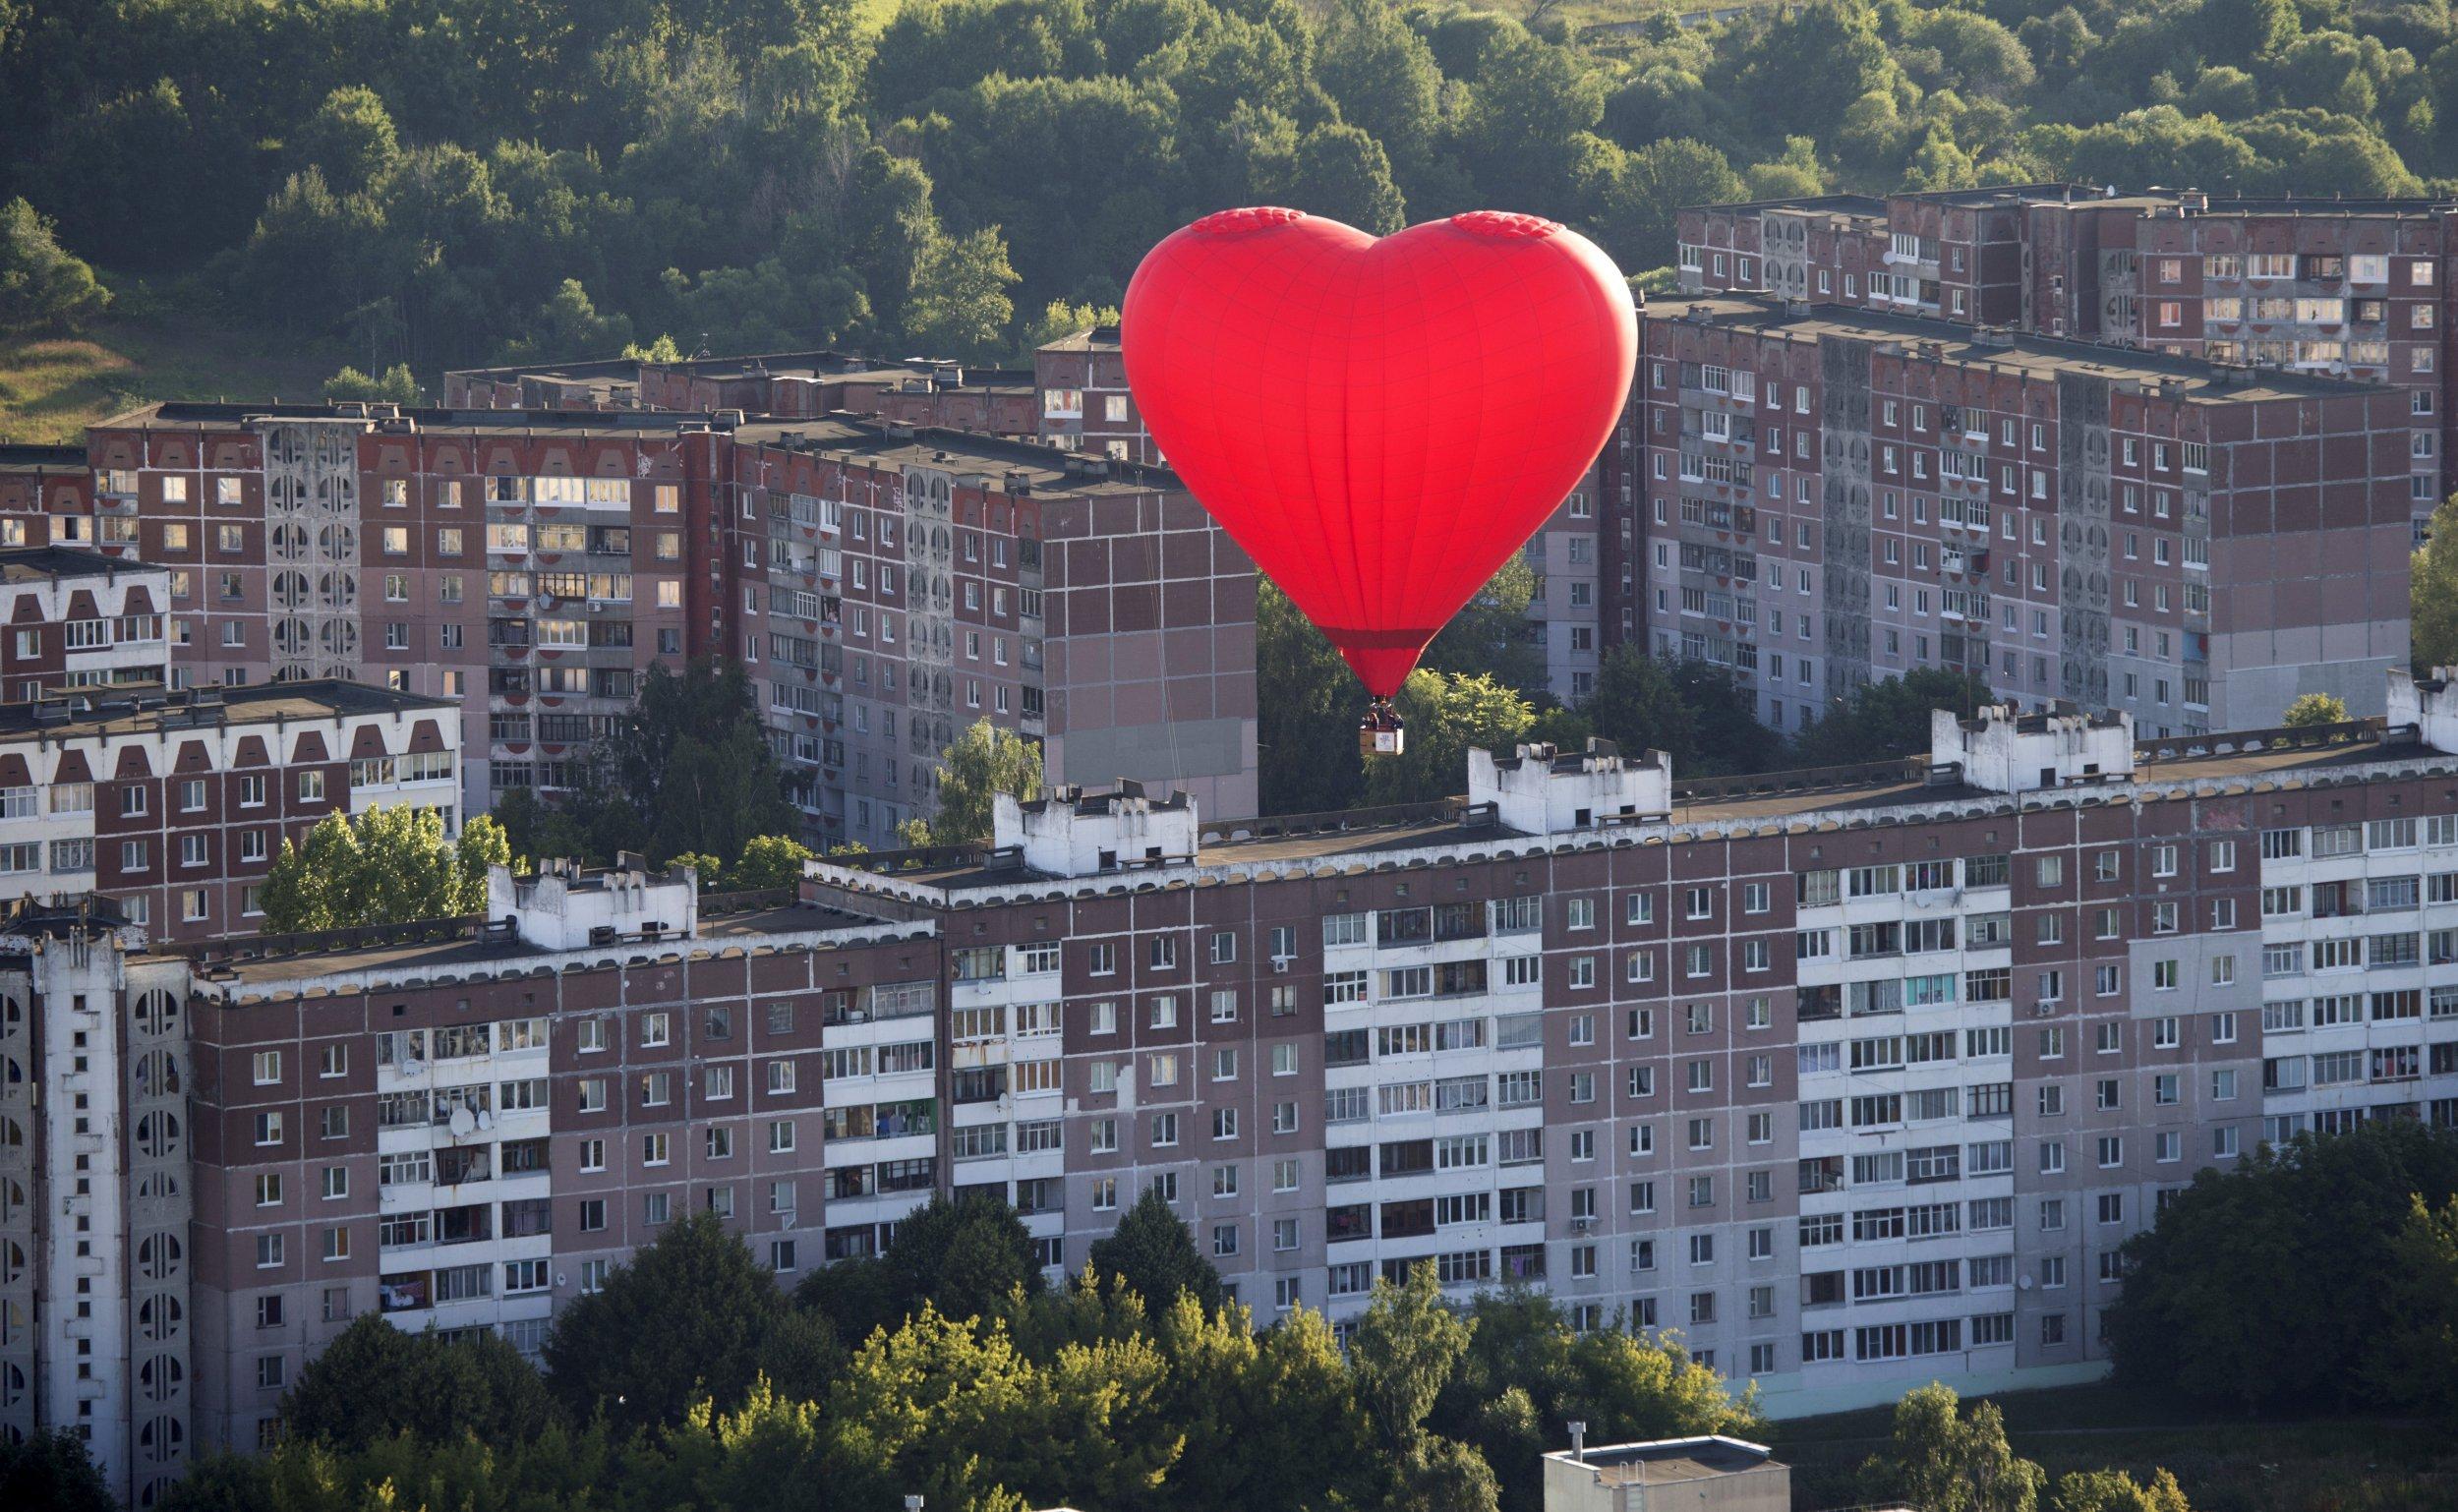 Heartshaped hot air balloon flies above communist buildings